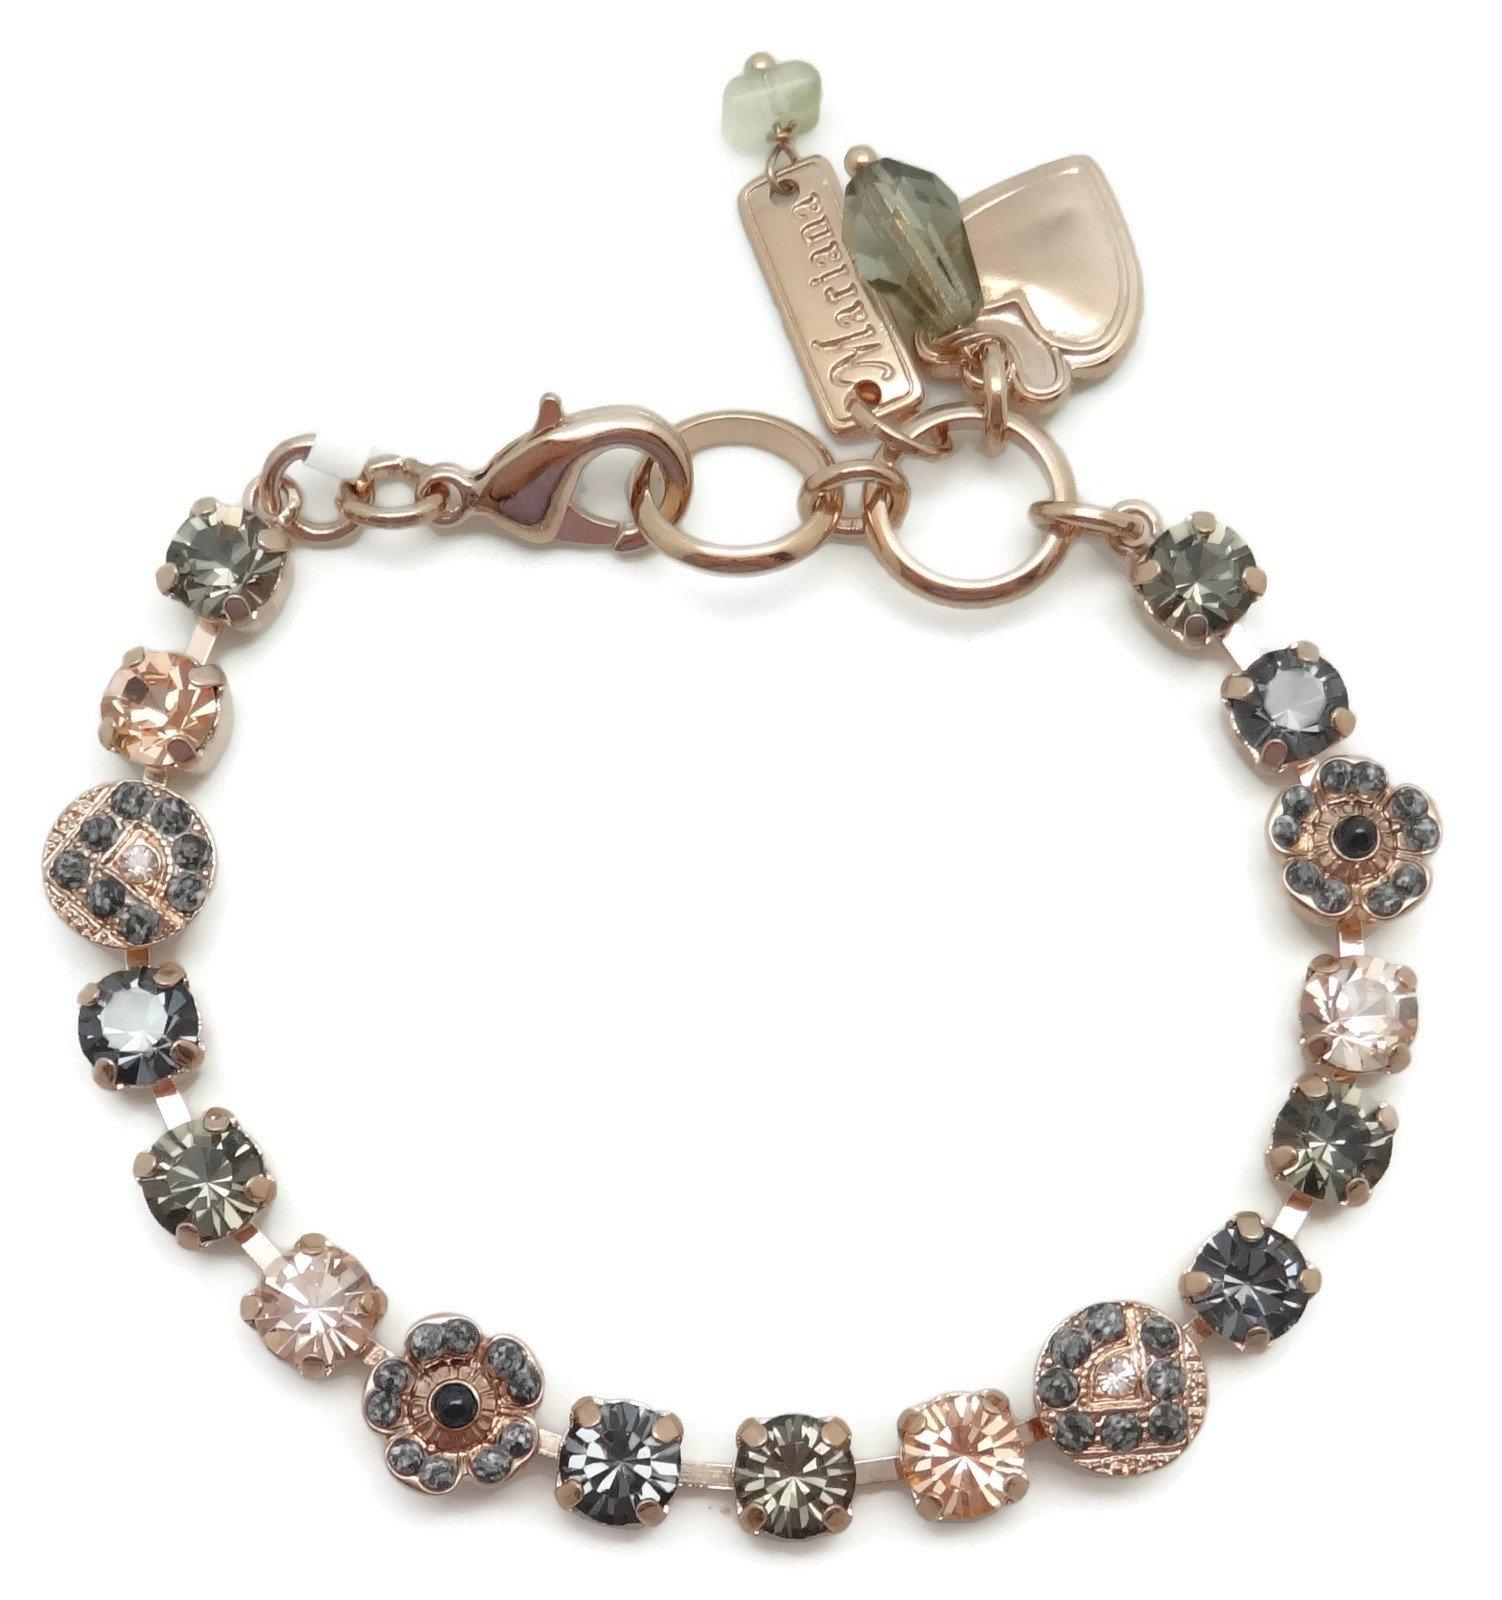 Mariana Swarovski Crystal Rose Gold Plated Bracelet Petite Peach Grey Black Mosaic 1035 Luxury